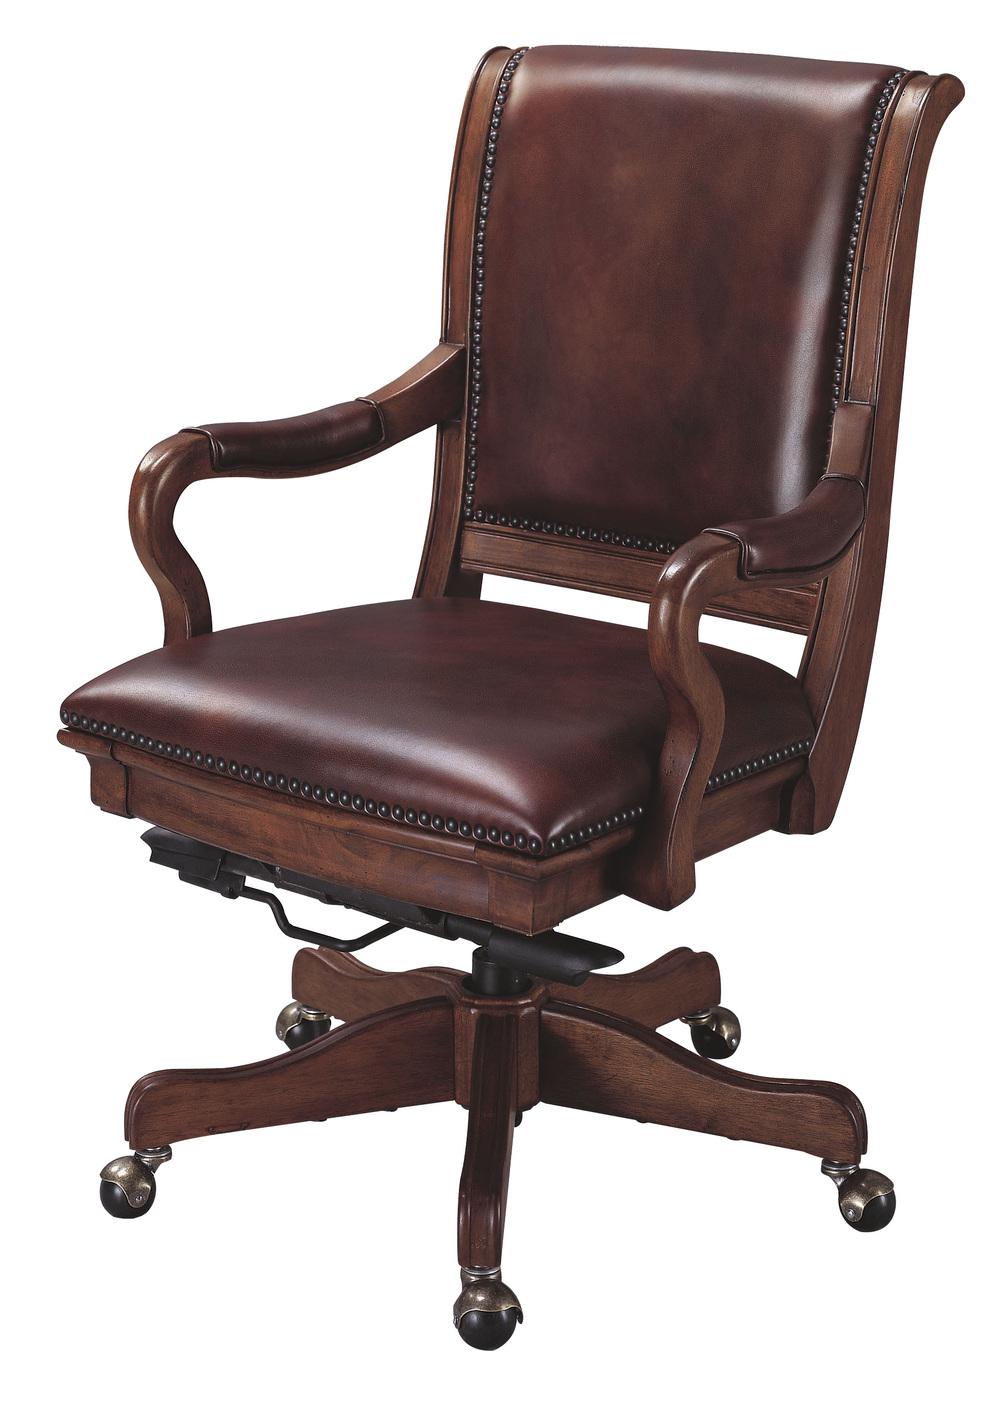 Aspenhome - Richmond Executive Chair